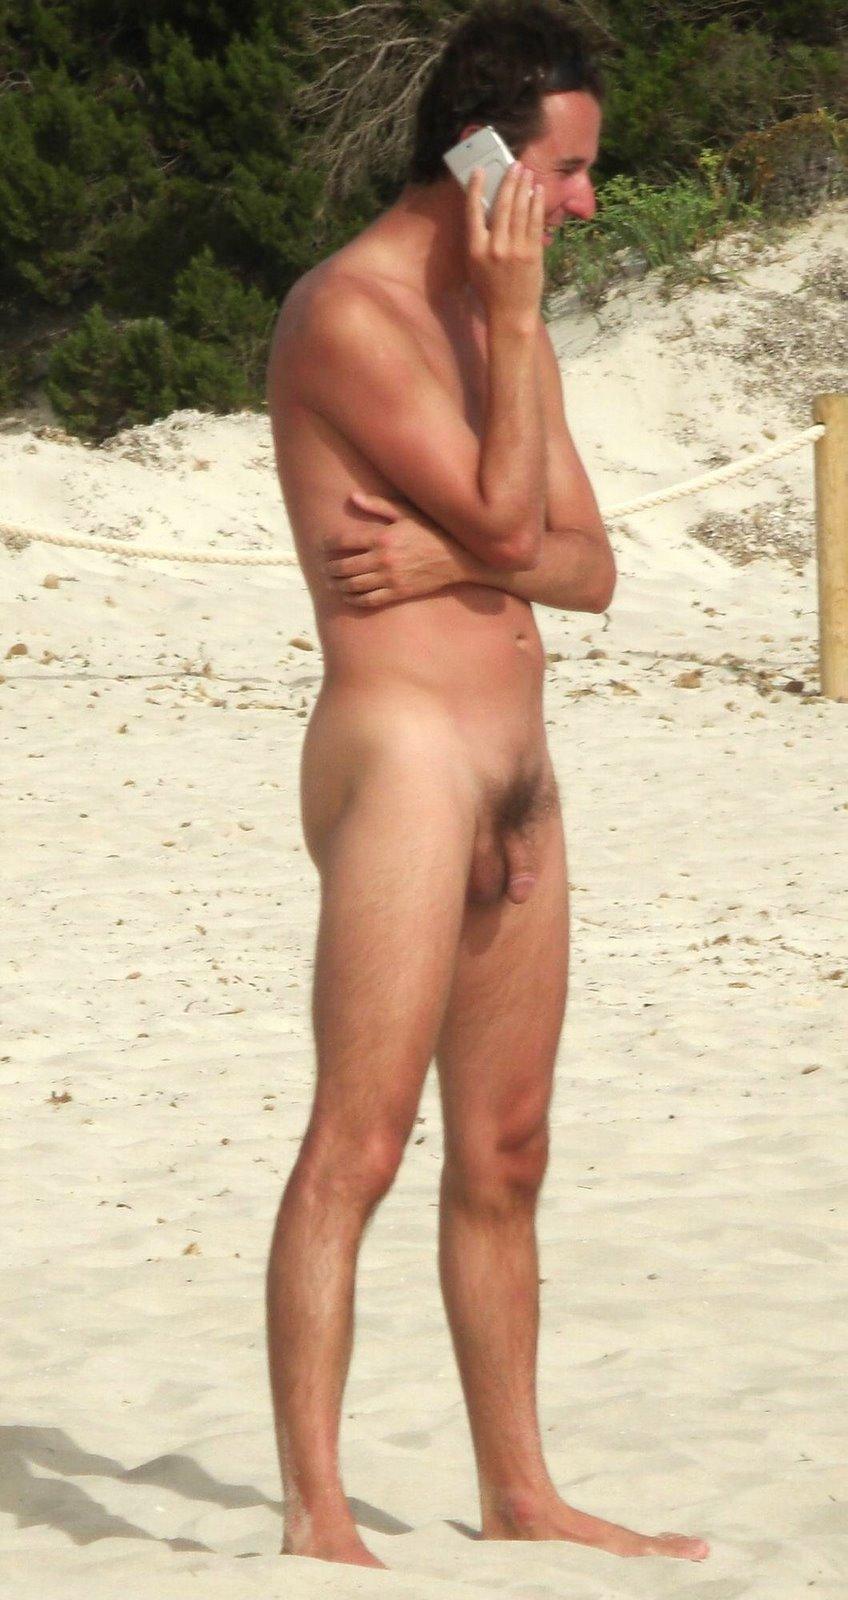 Etiquetas: beach, desnudo, espia, naked, nudists, pics, playa, public, spy, ...